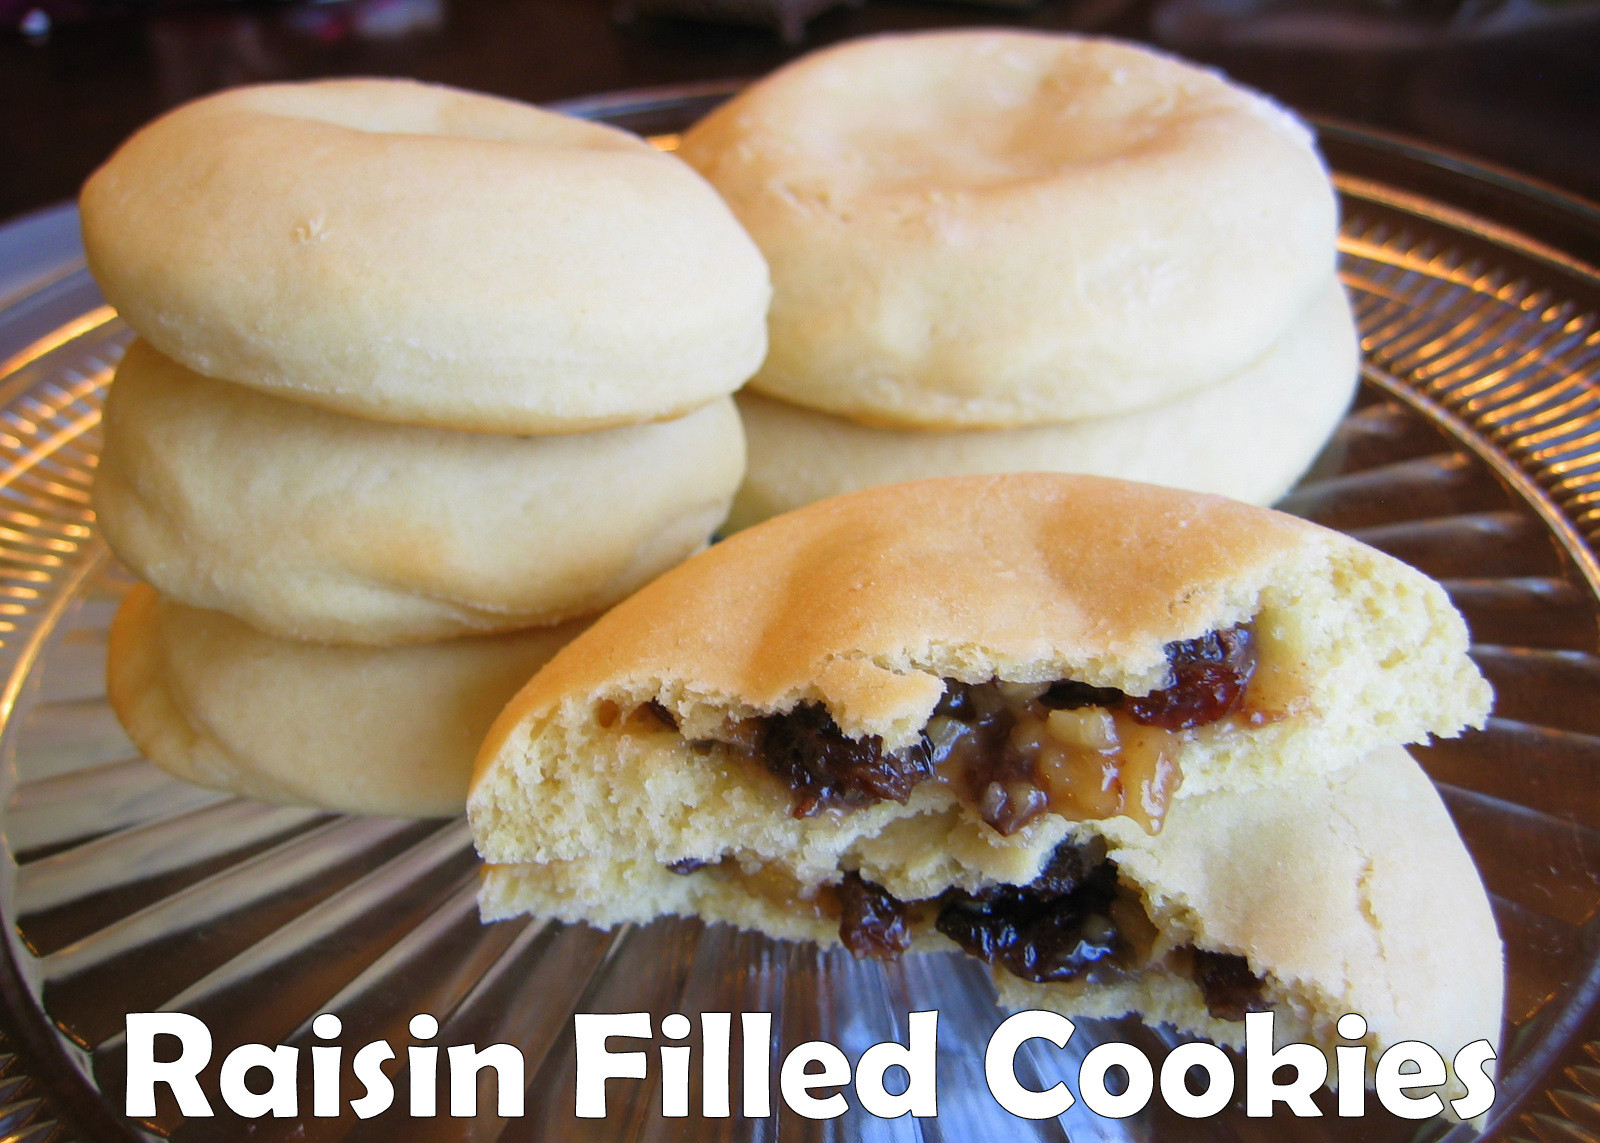 Raisin Filled Cookies  Pink Cookies with Sprinkles Sugar Cookie dough e